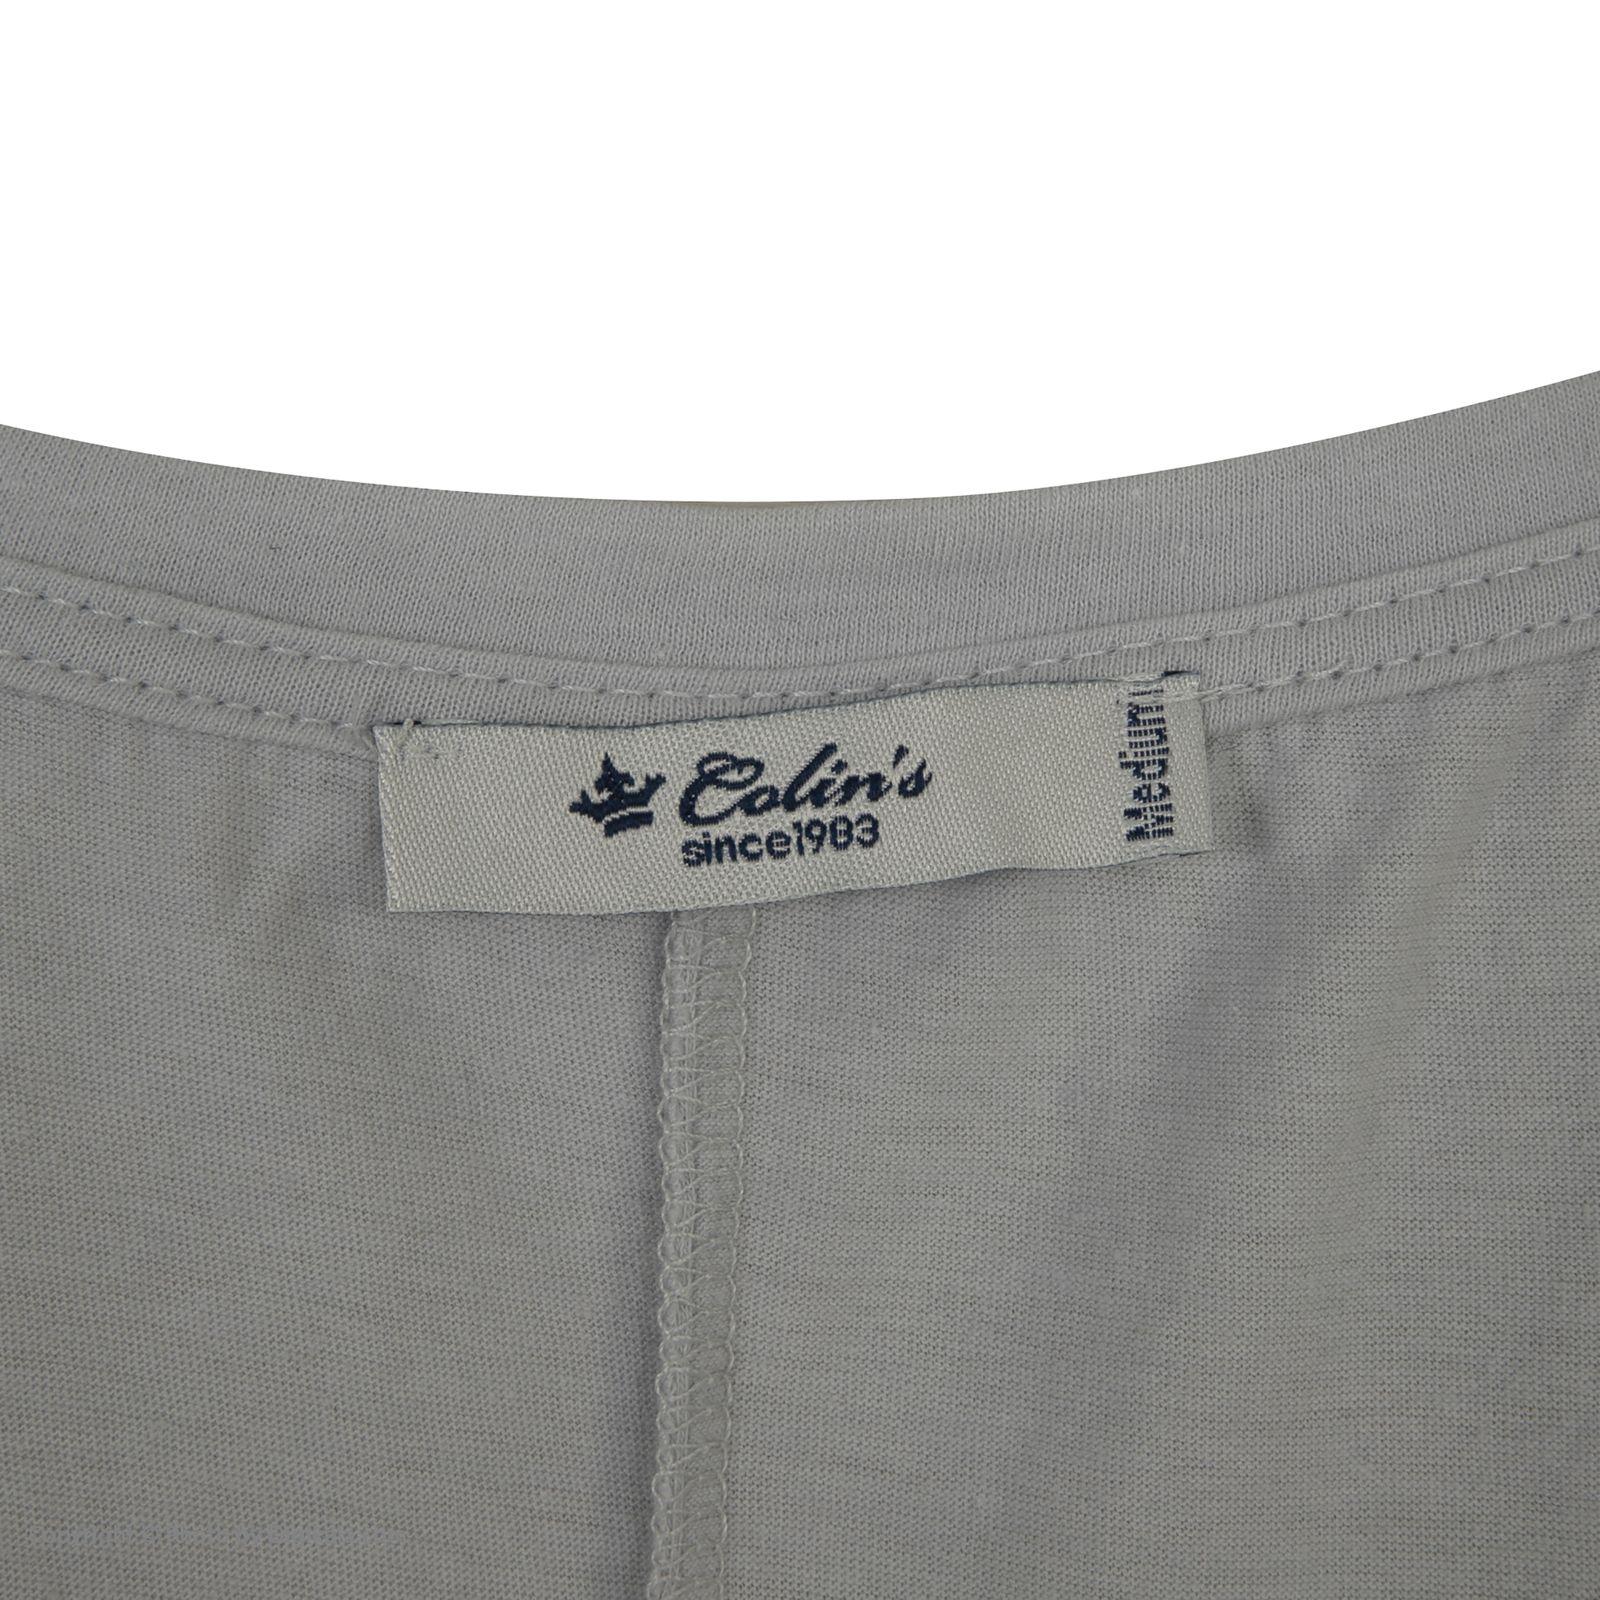 تی شرت زنانه کالینز مدل CL1033142-LIGHTBLUE main 1 5